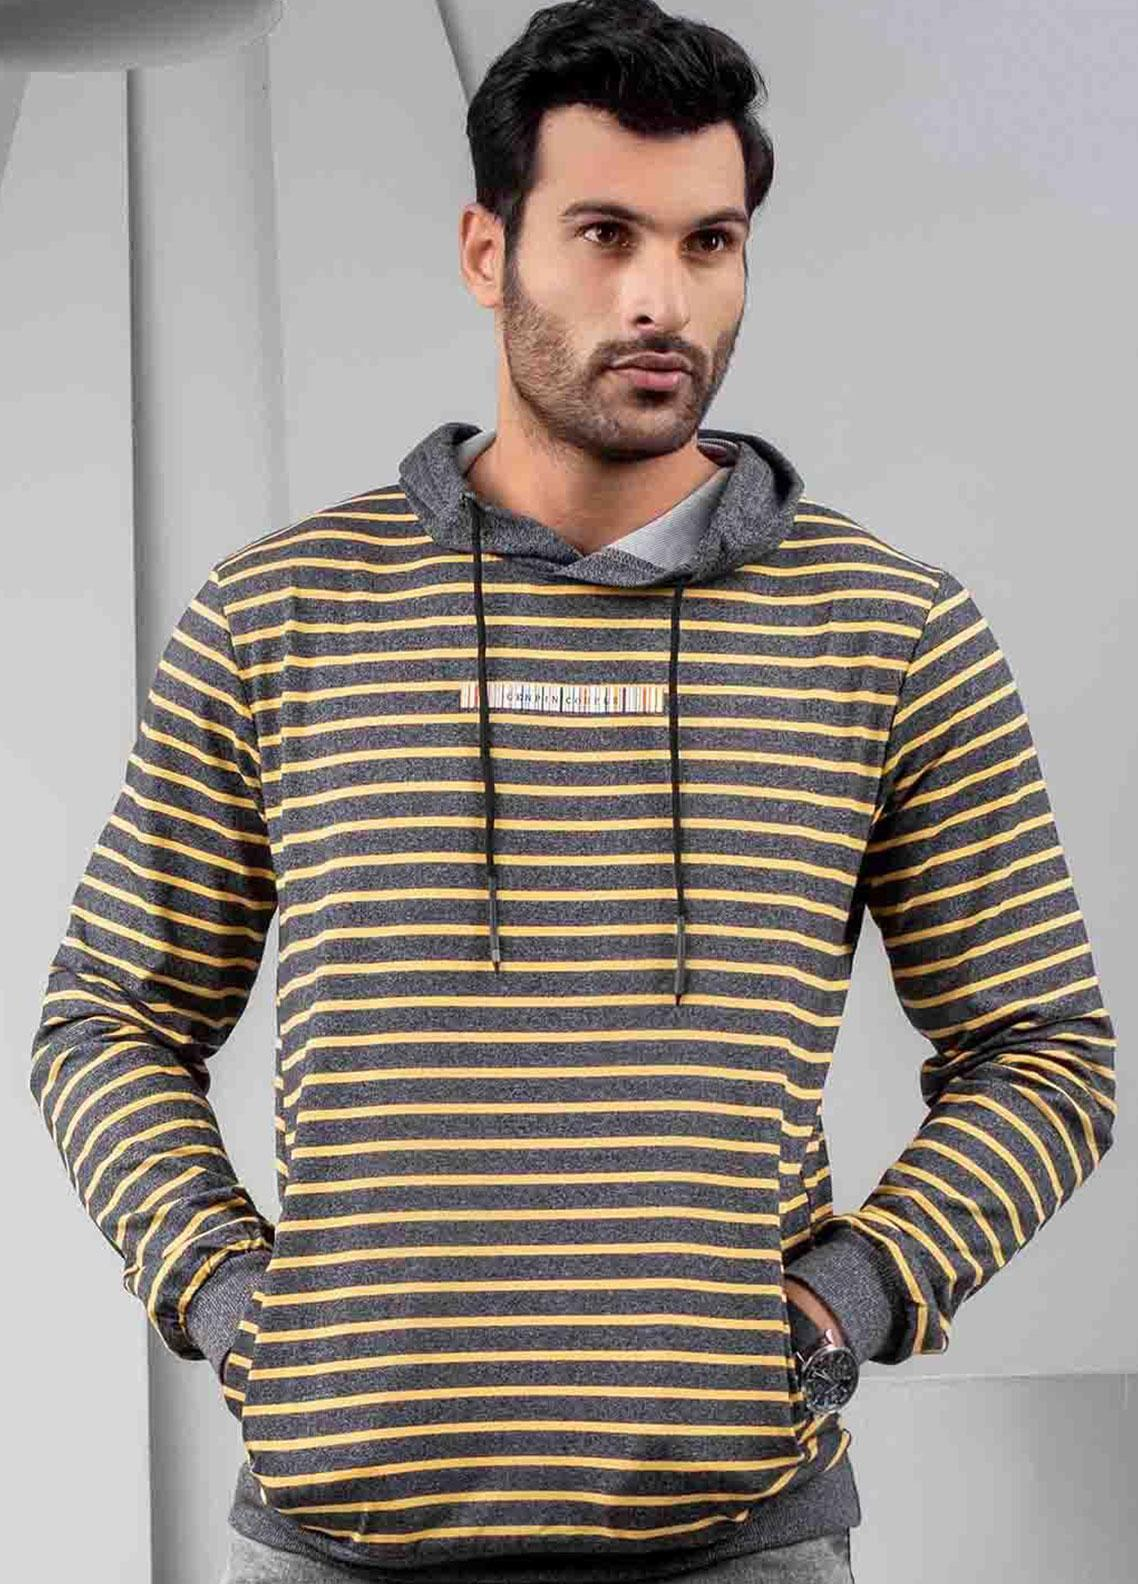 Ignite Wardrobe Cotton Pullover  Hoodies for Men -  IG20HDM 003